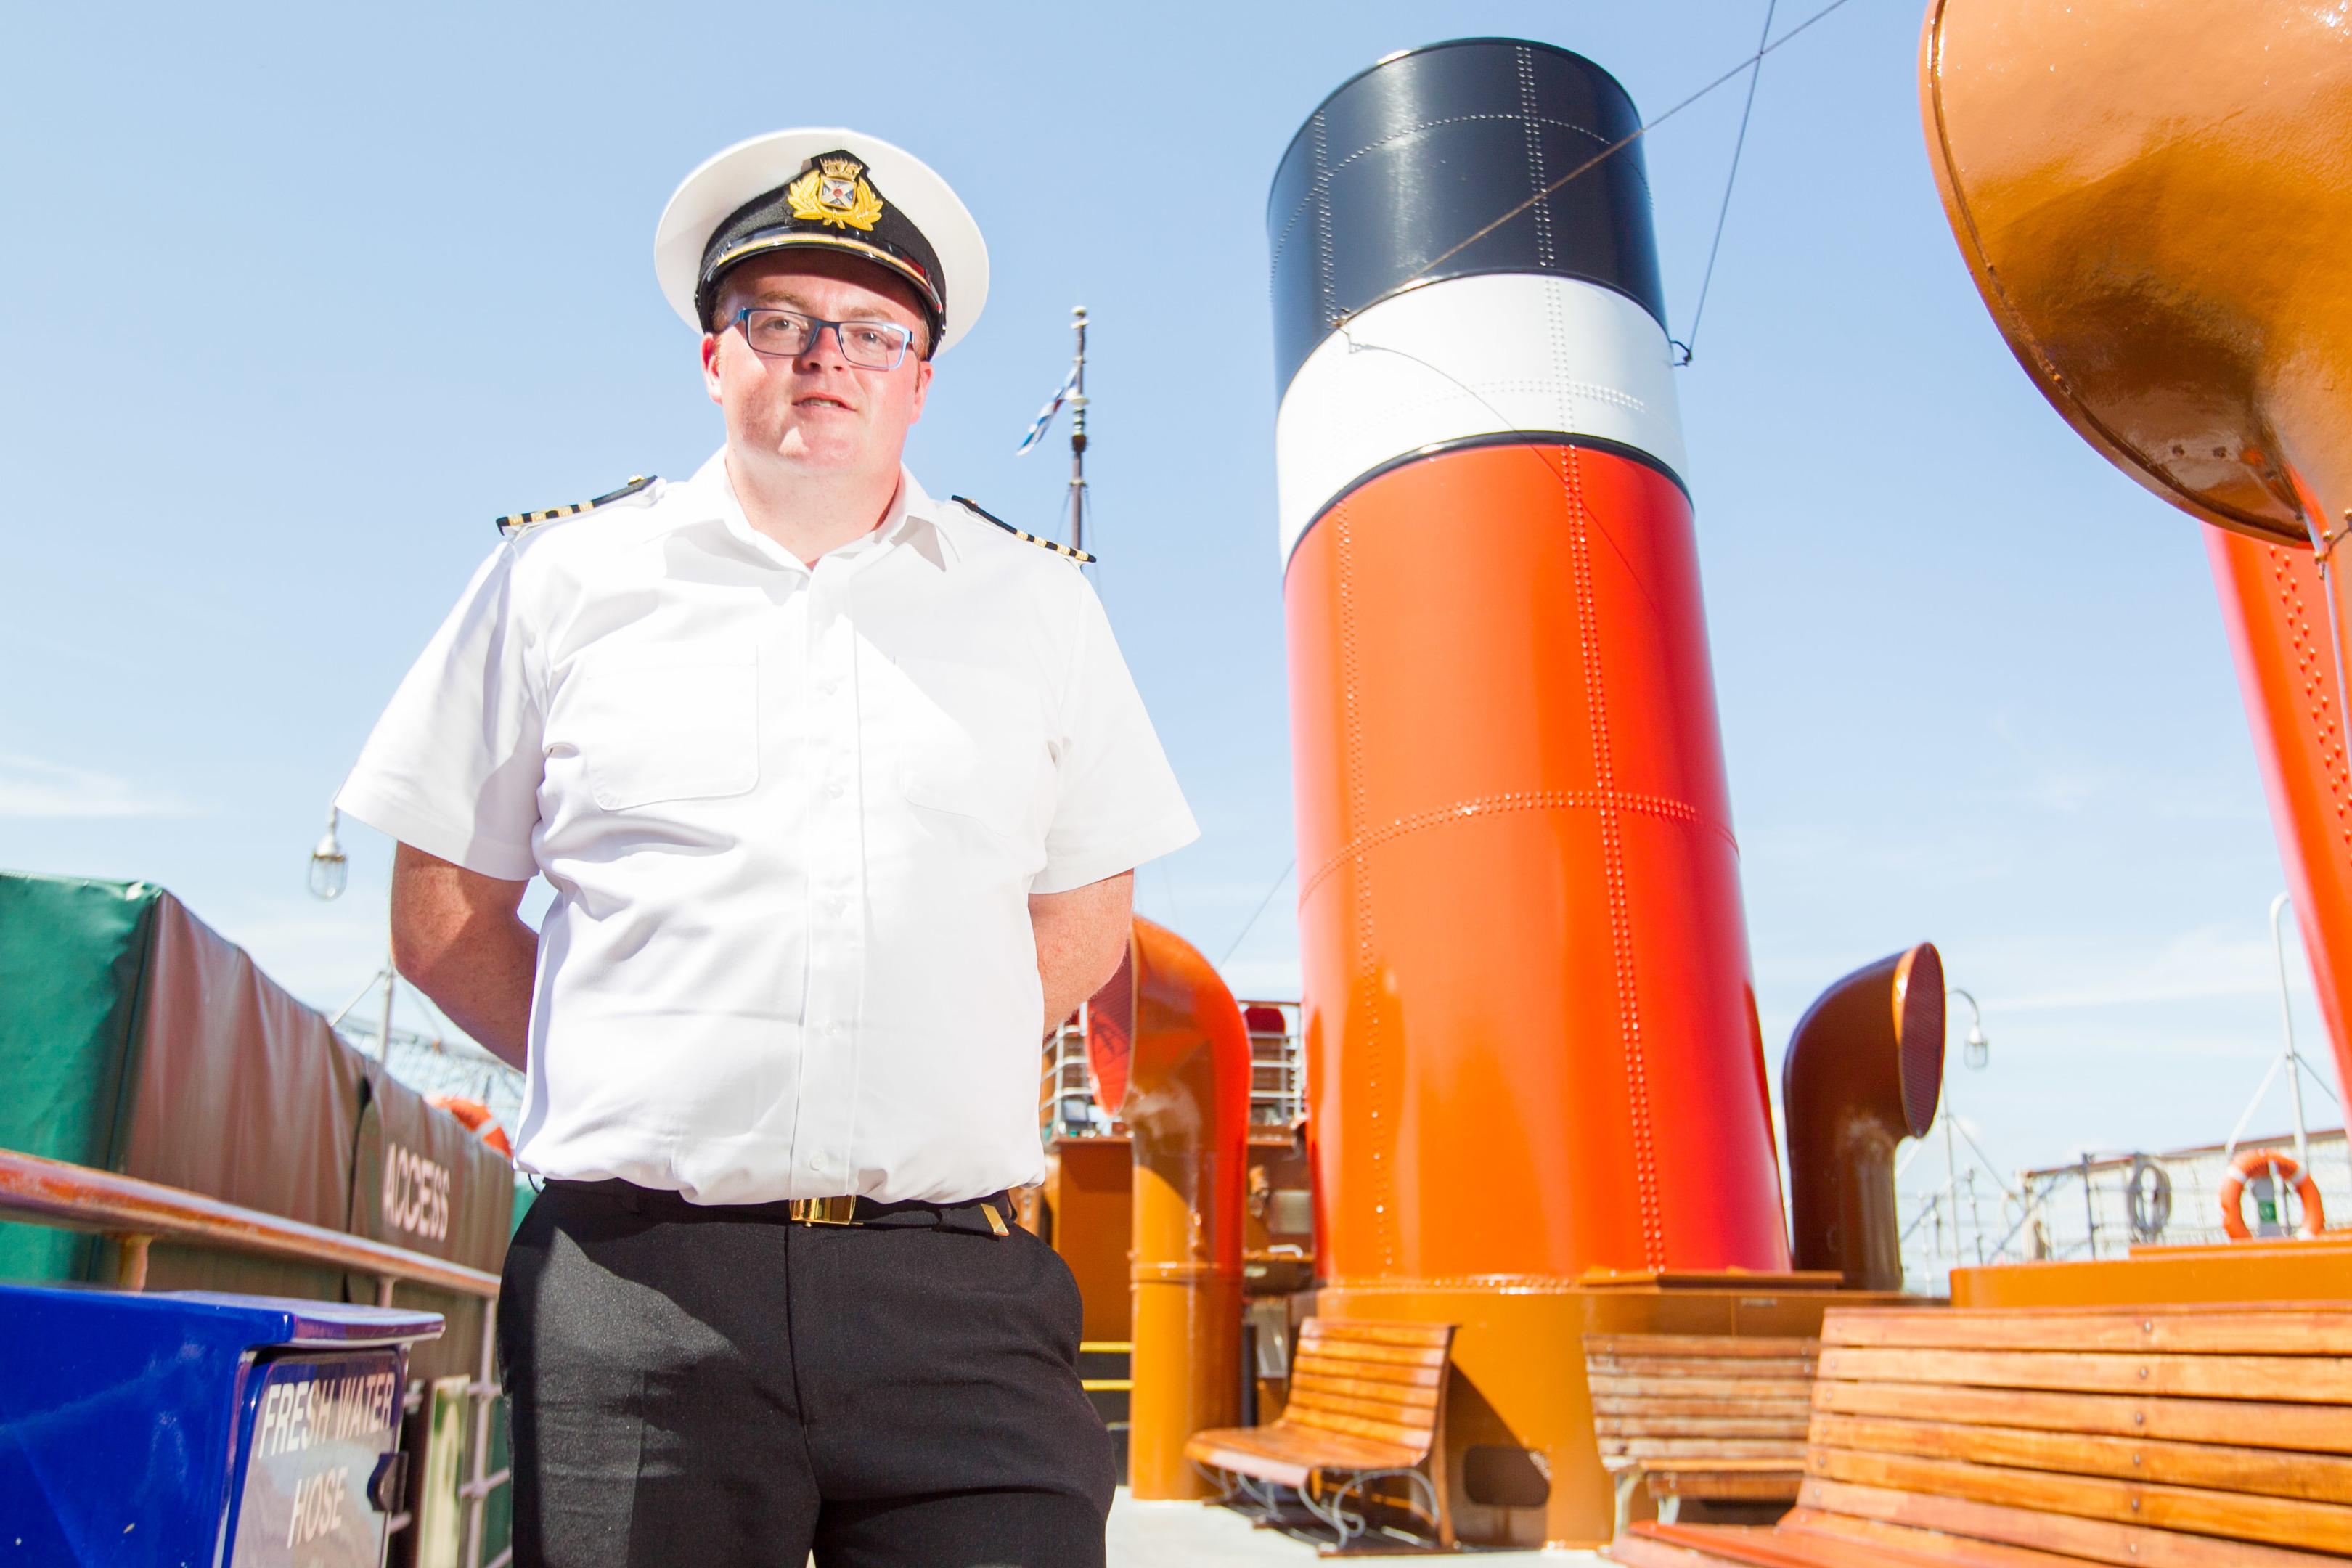 New PS Waverley Master Captain John Simm on board the paddle steamer (Chris Austin / DC Thomson)